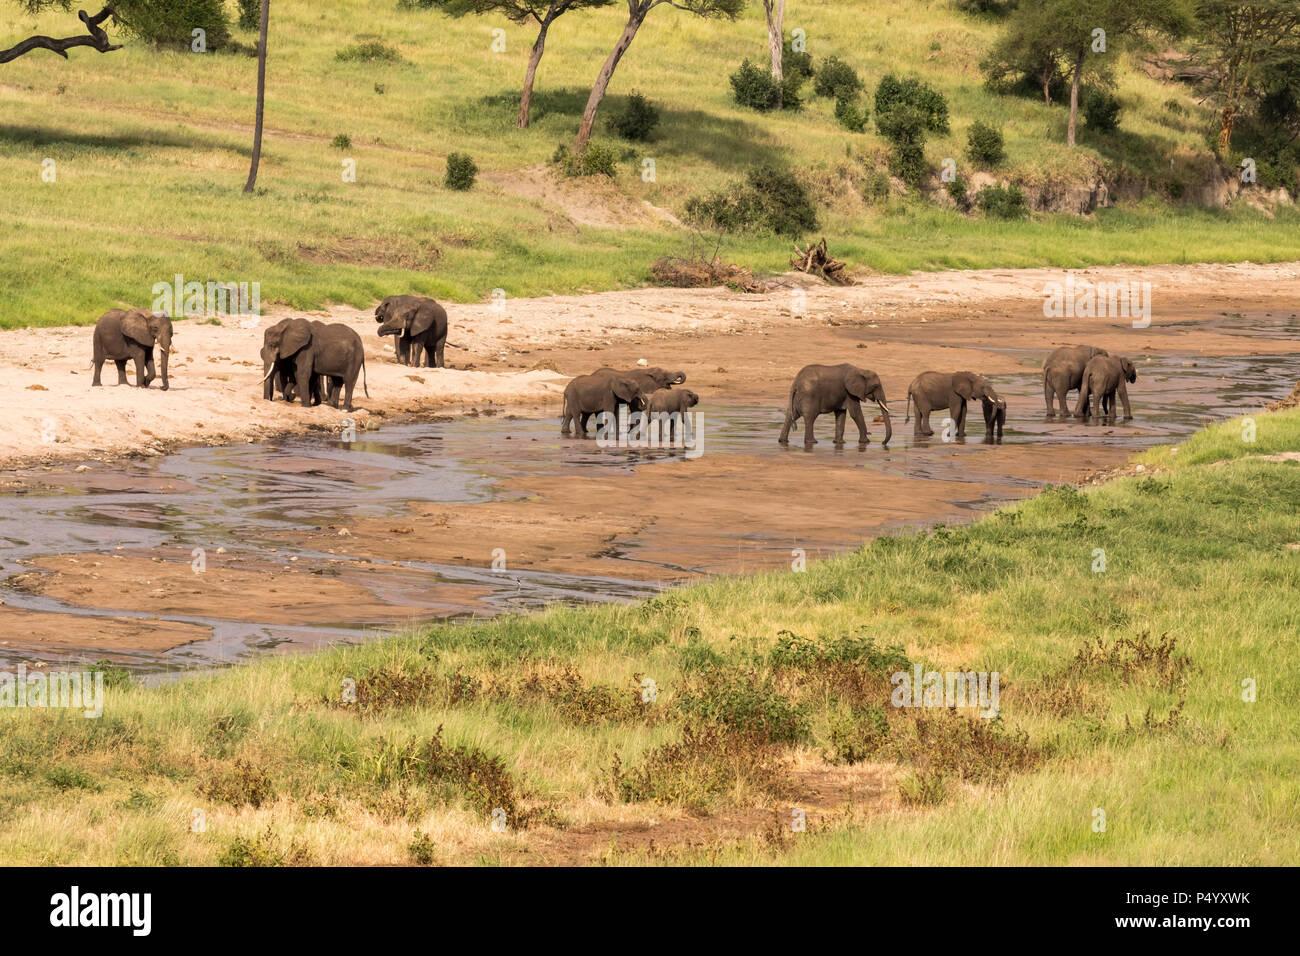 African Elephant (Loxodonta africana) herd drinking water from Tarangire River in Tarangire National Park, Tanzania - Stock Image